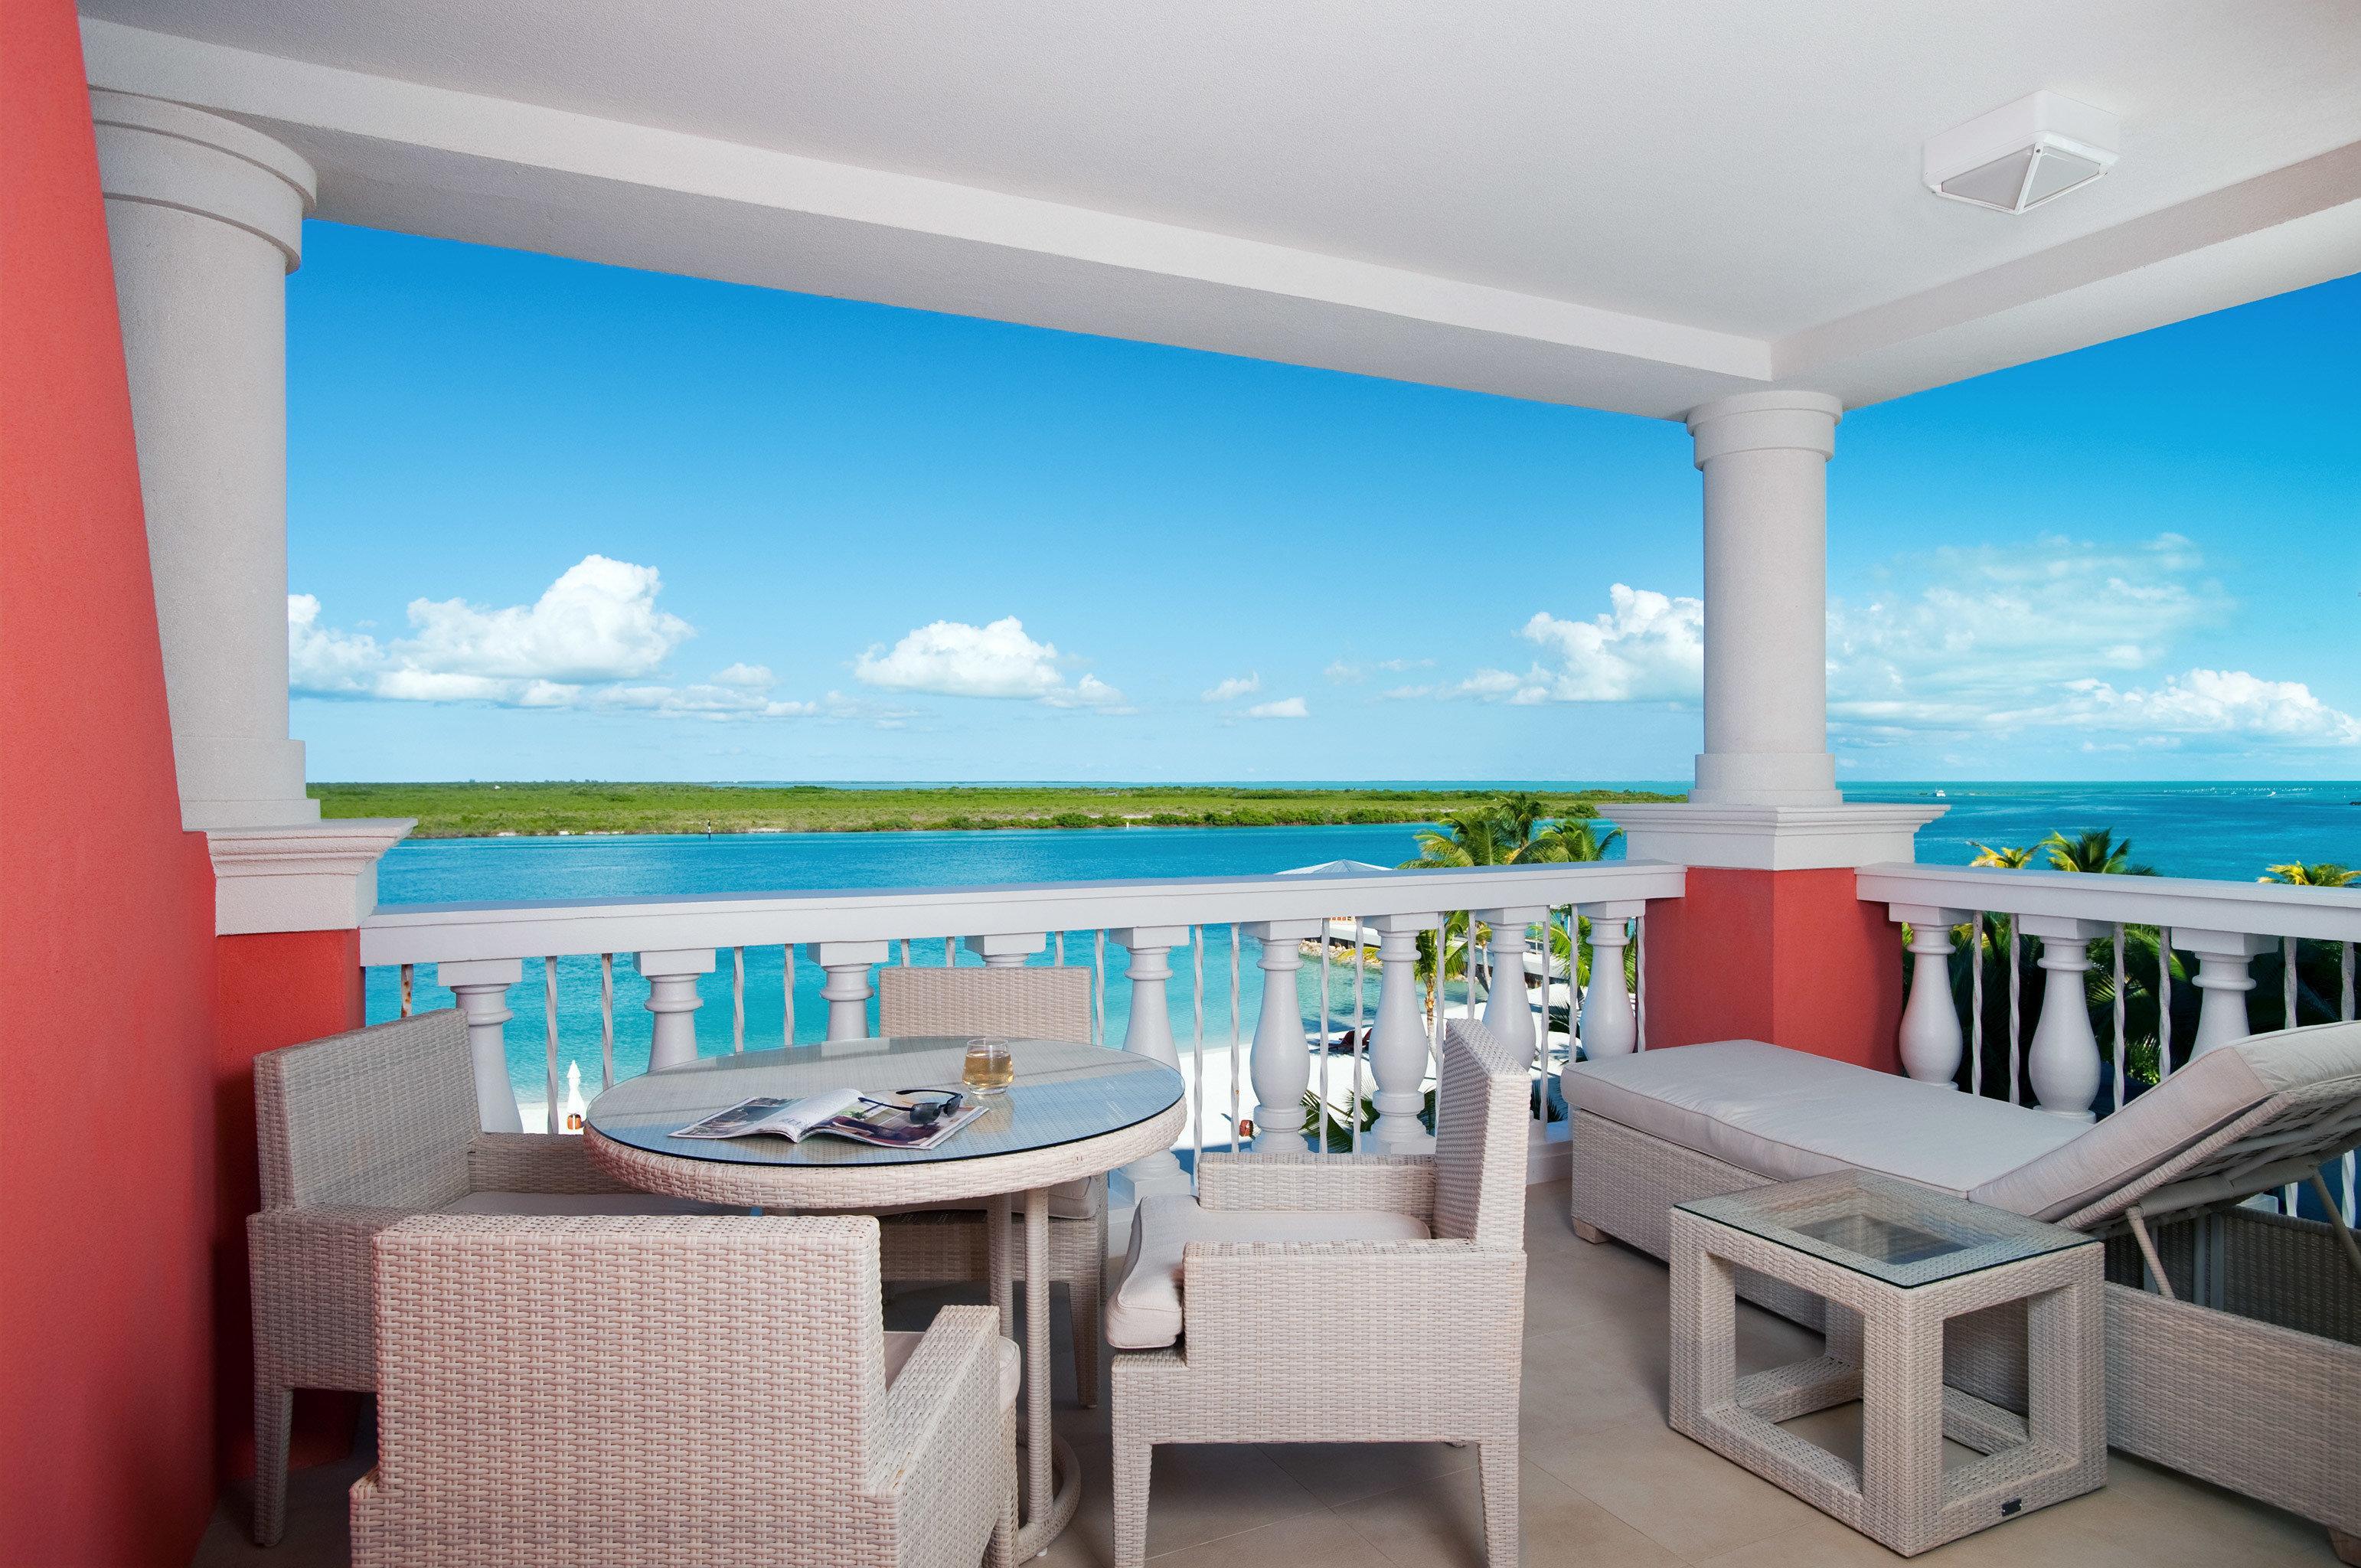 Beachfront Drink Eat Grounds Resort property chair swimming pool Suite Villa home condominium caribbean